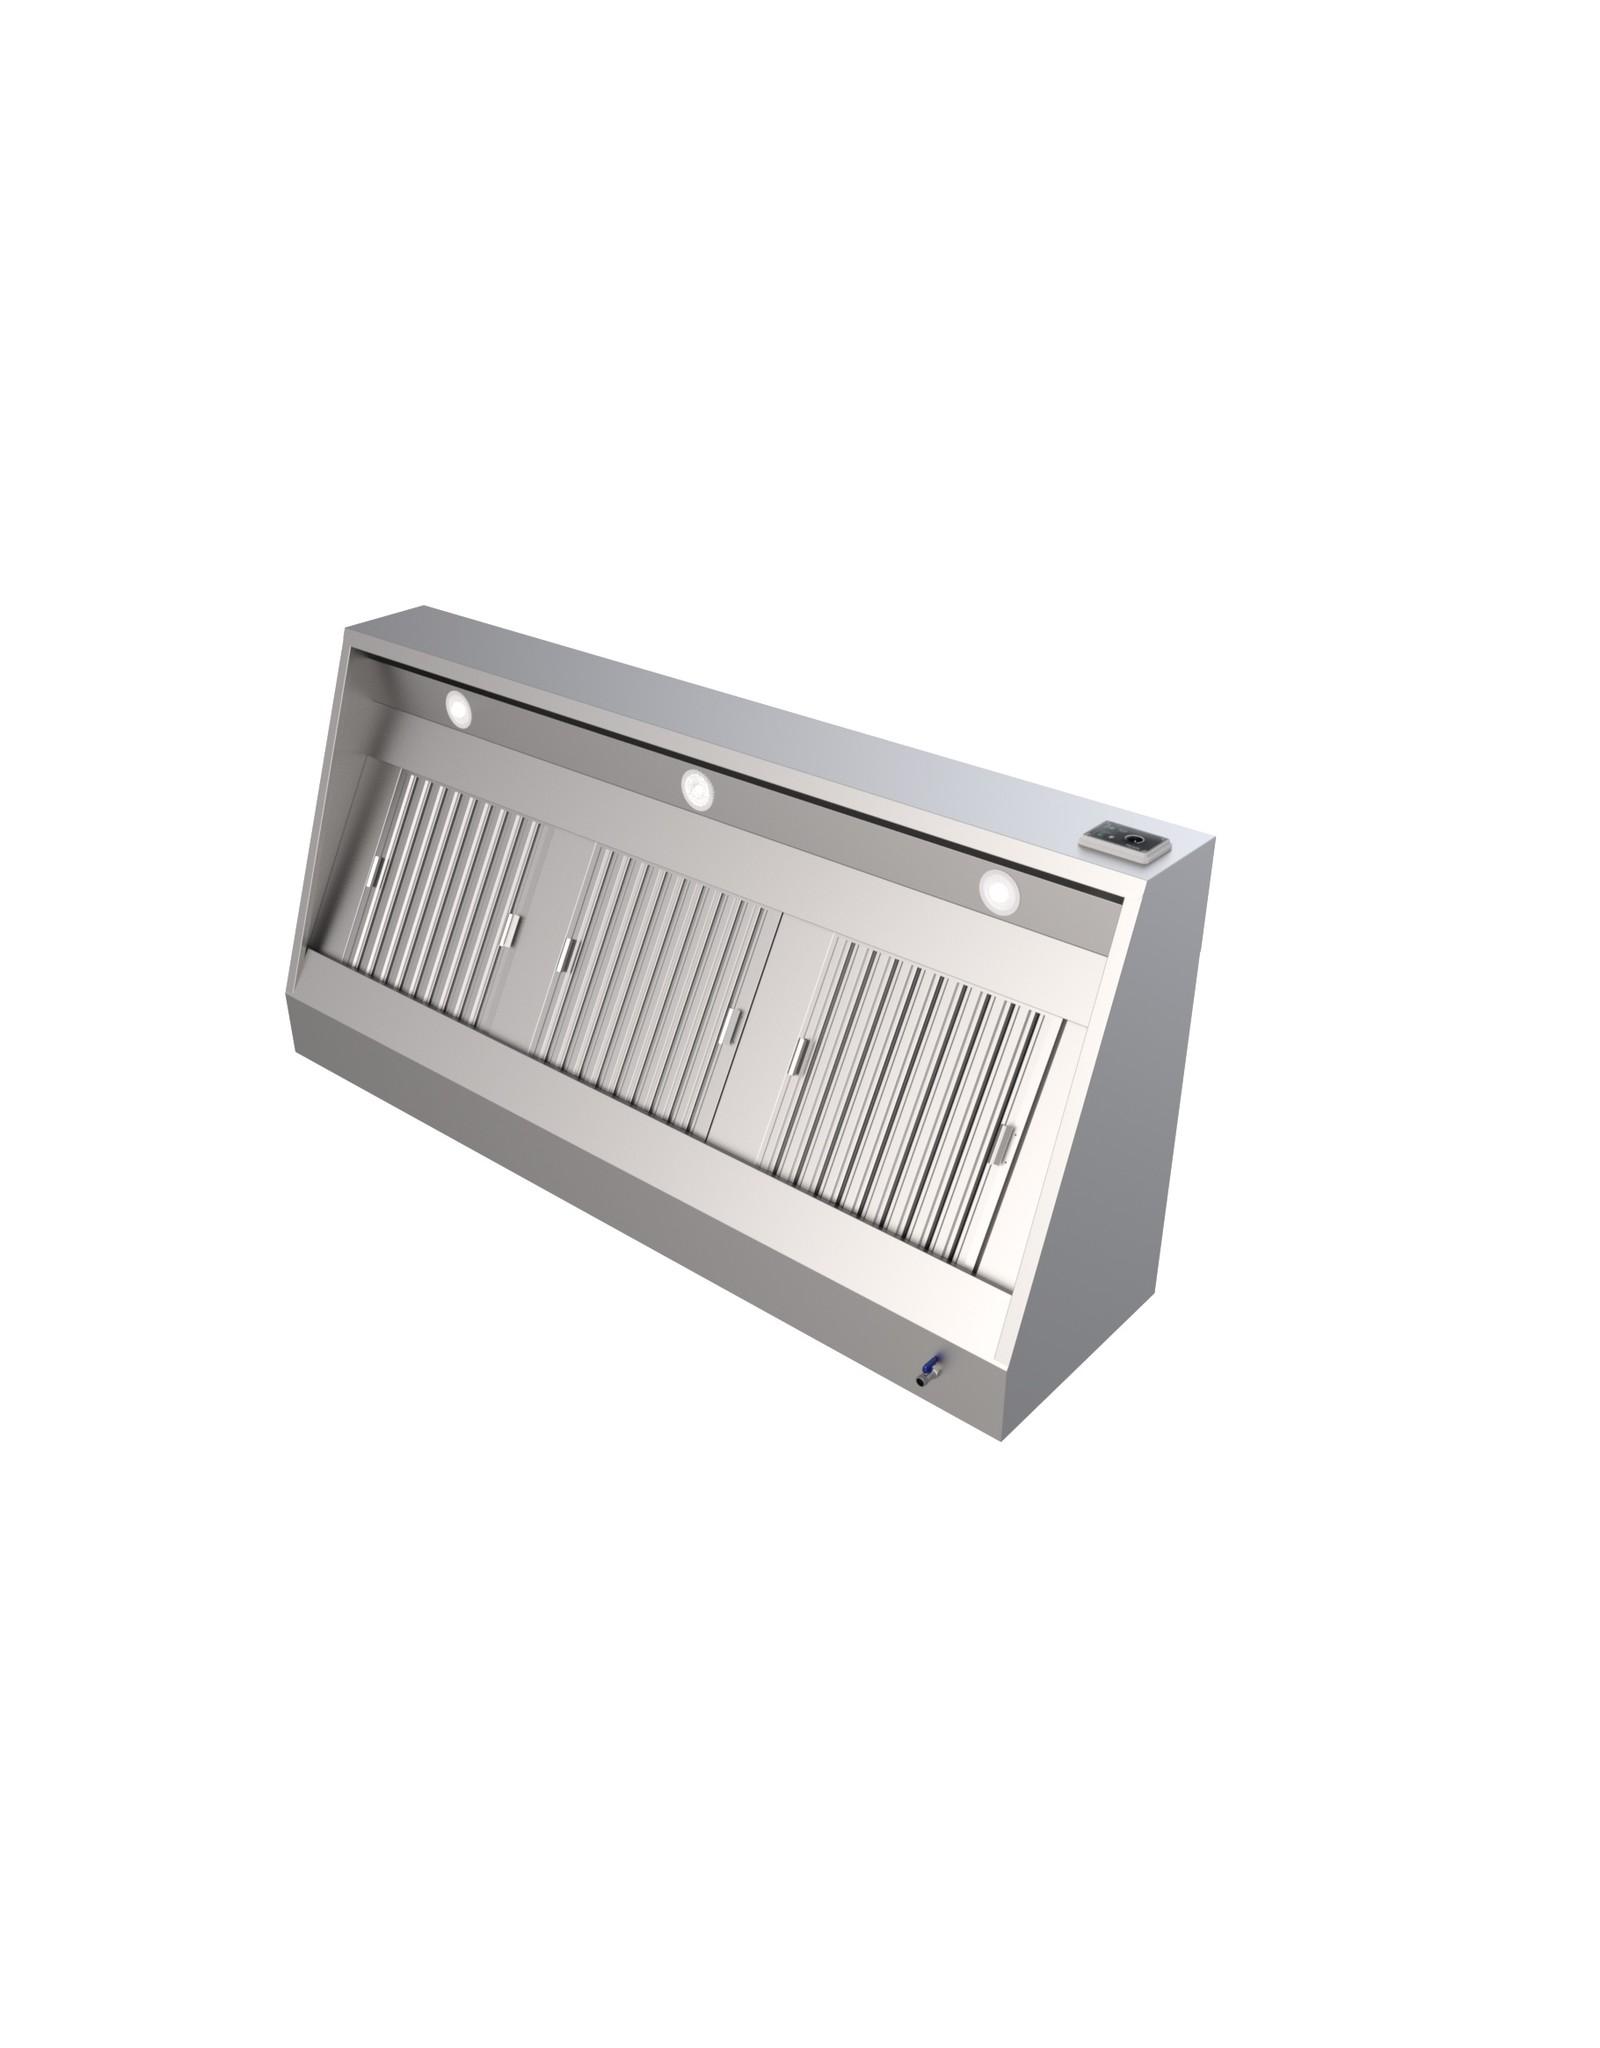 Q-Gastro RVS Afzuigkap NIEUW!! Verlichting+filter 160x70x45